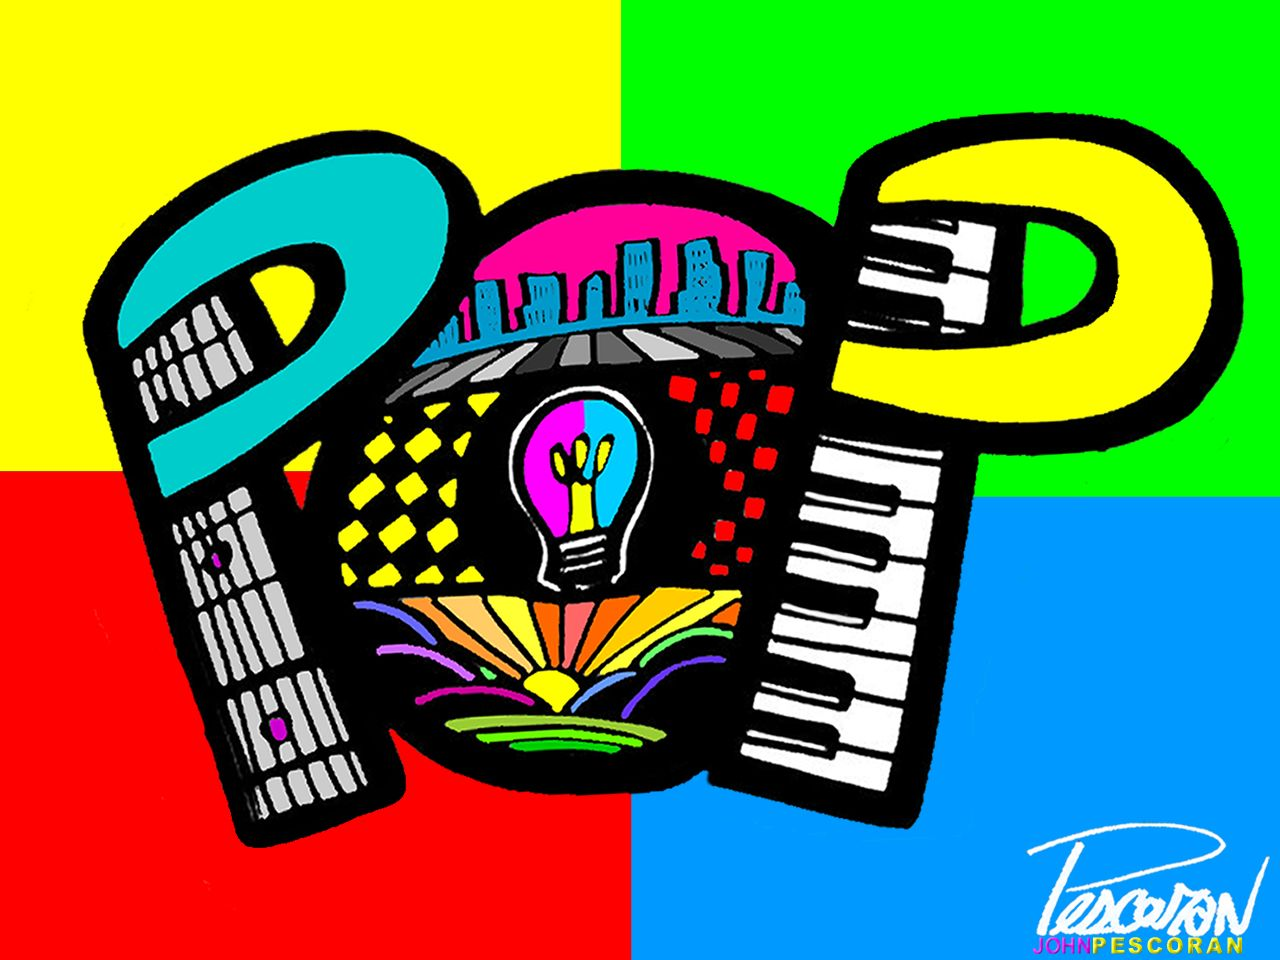 Download Pop Art Wallpaper Hd Backgrounds Download Itl Cat